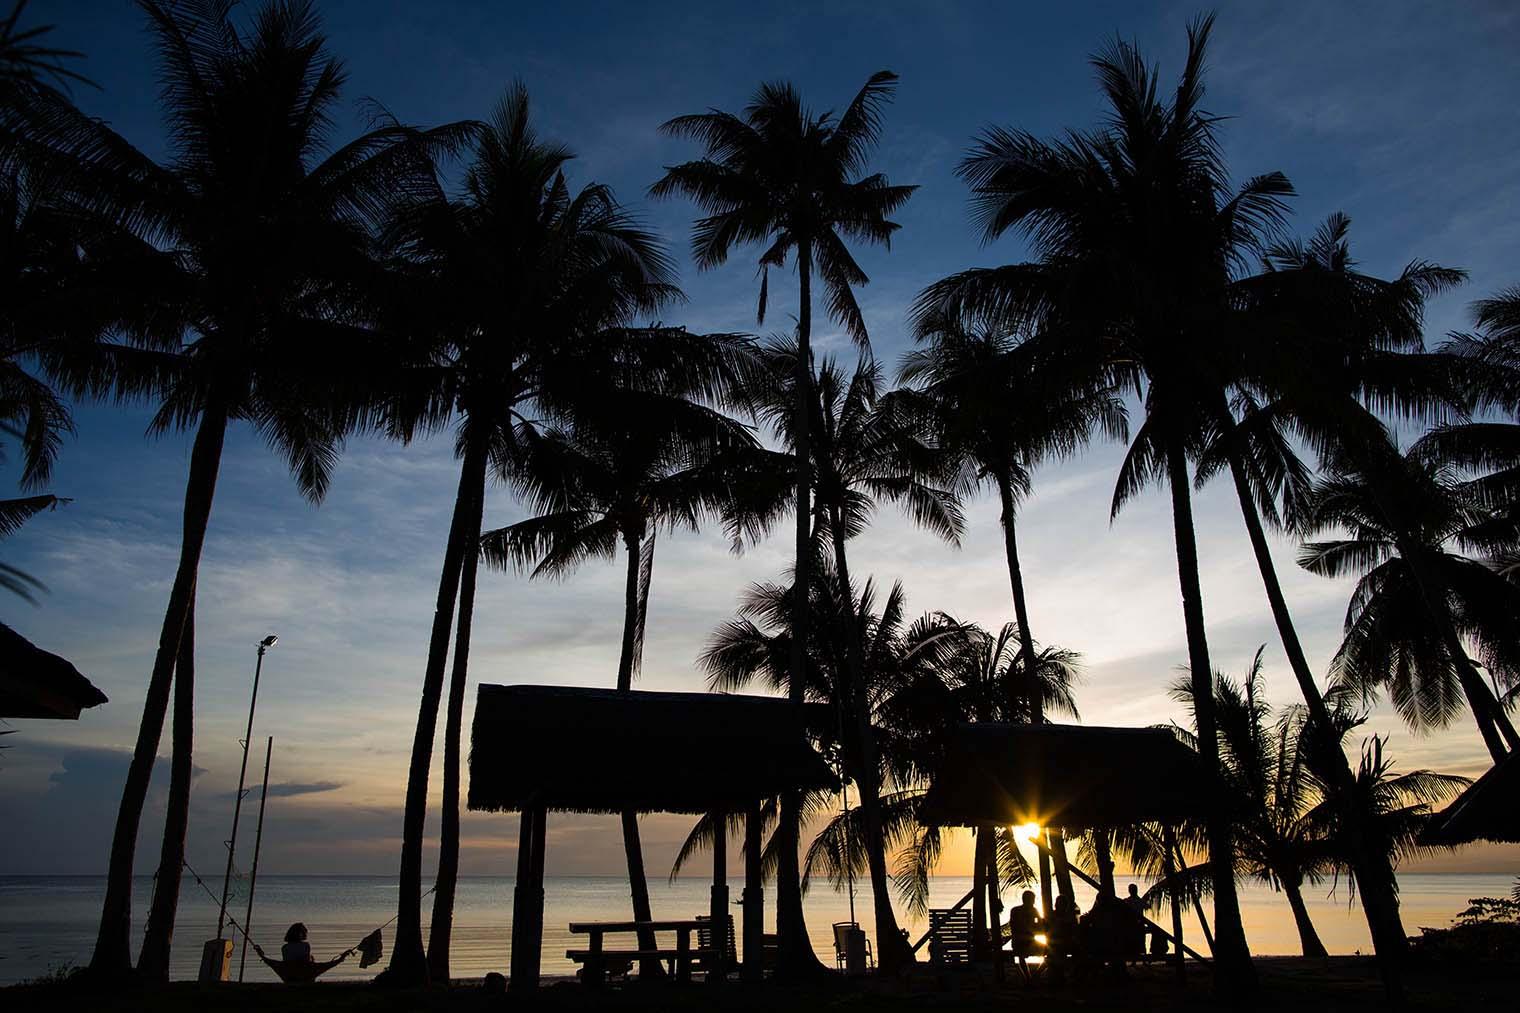 Philippines Travel Pictures